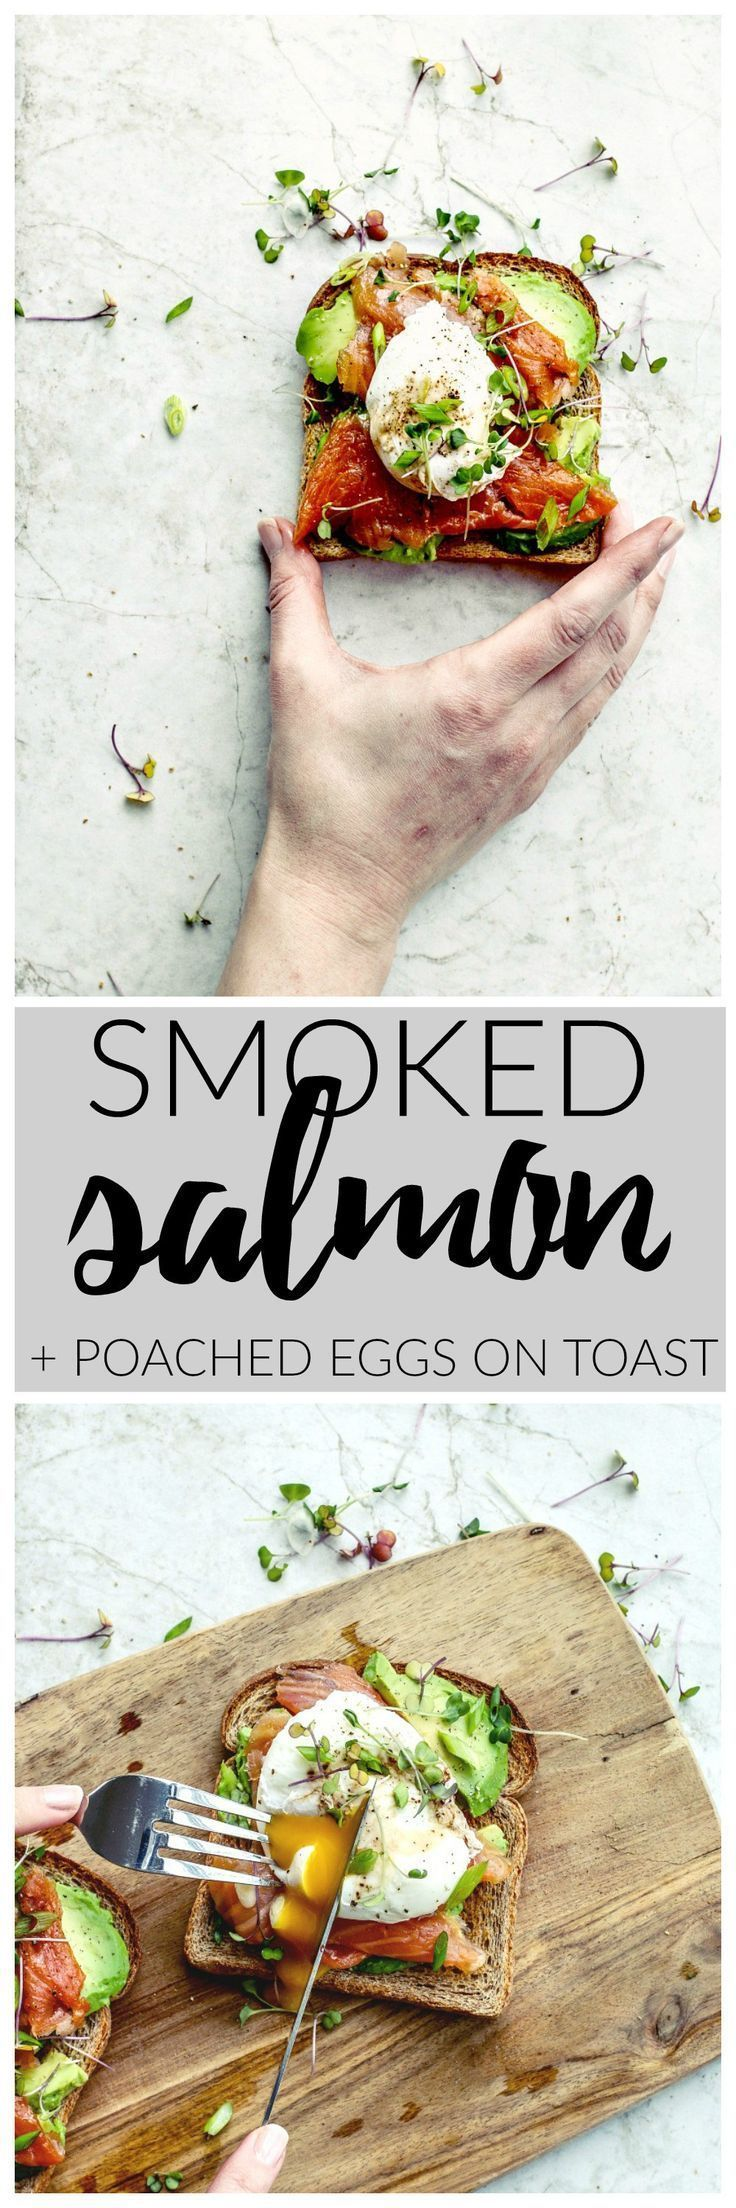 Smoked Salmon Poached Eggs on Toast recipe! | Killing Thyme // Avocado toast / Pescatarian / Healthy breakfast #smokedsalmon #eggsontoast #toastrecipes #avocadotoast #healthybreakfast #pescatarian #pescatarianbreakfast